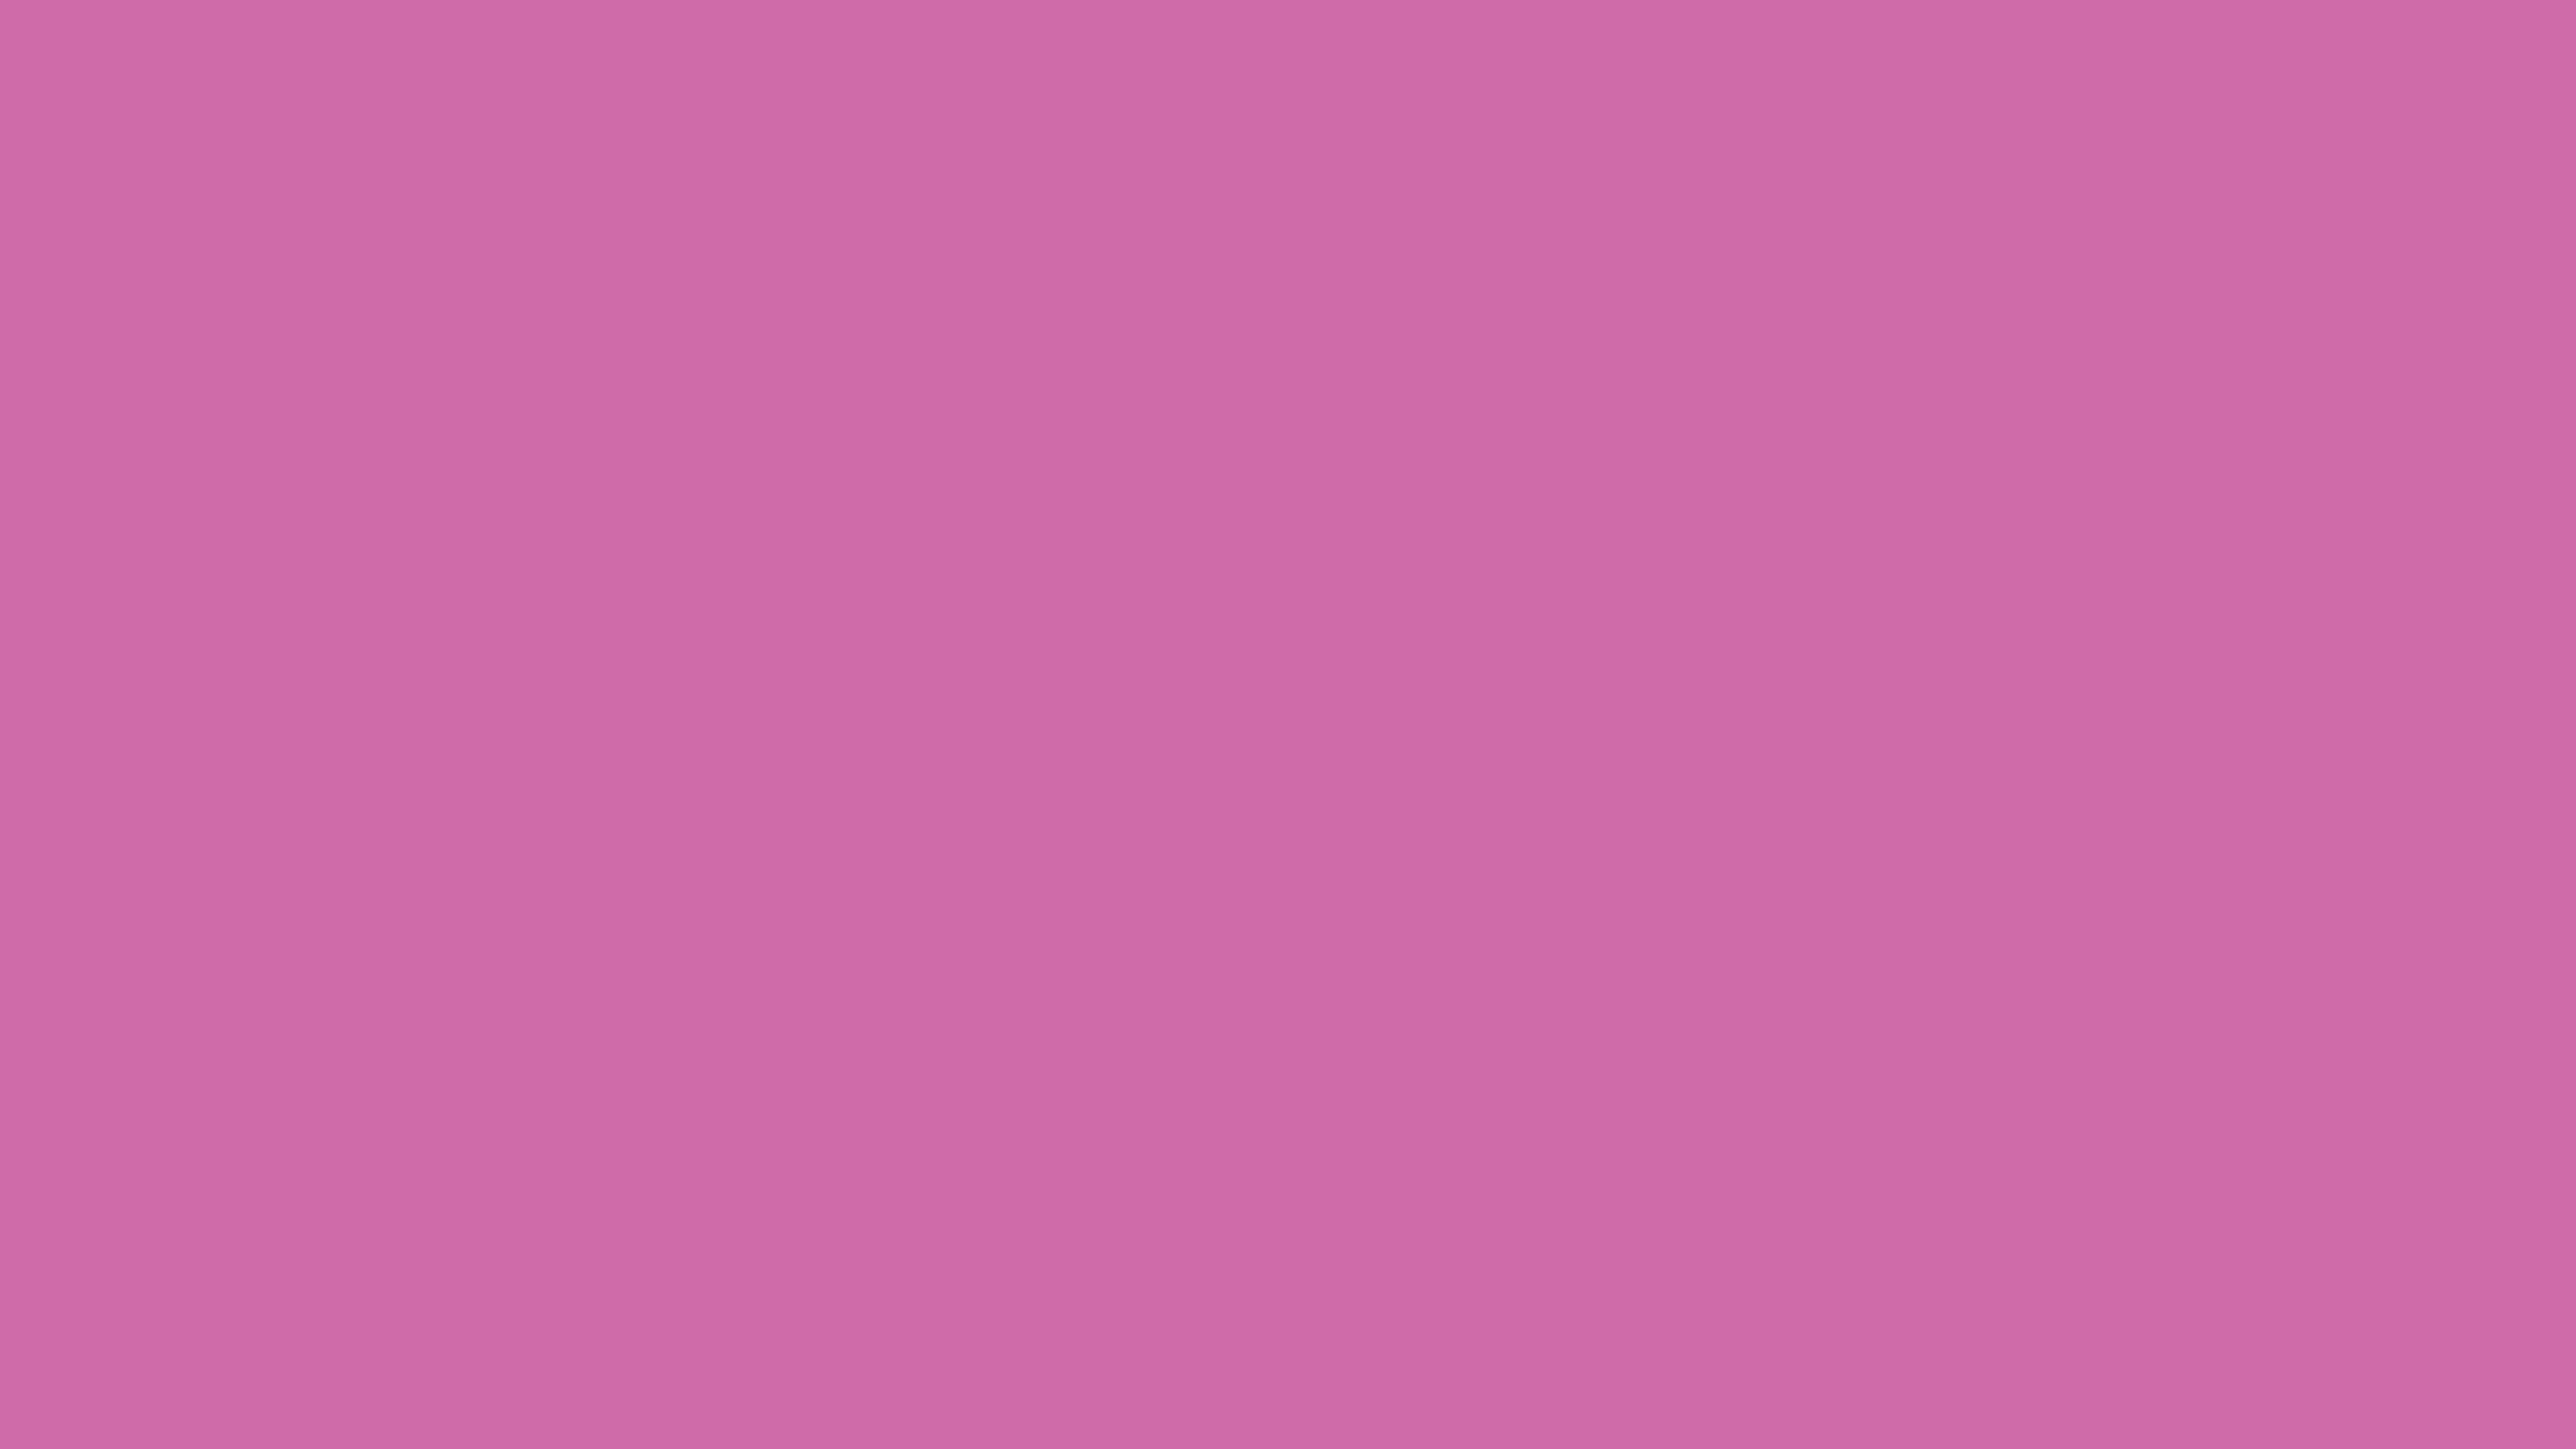 4096x2304 Super Pink Solid Color Background